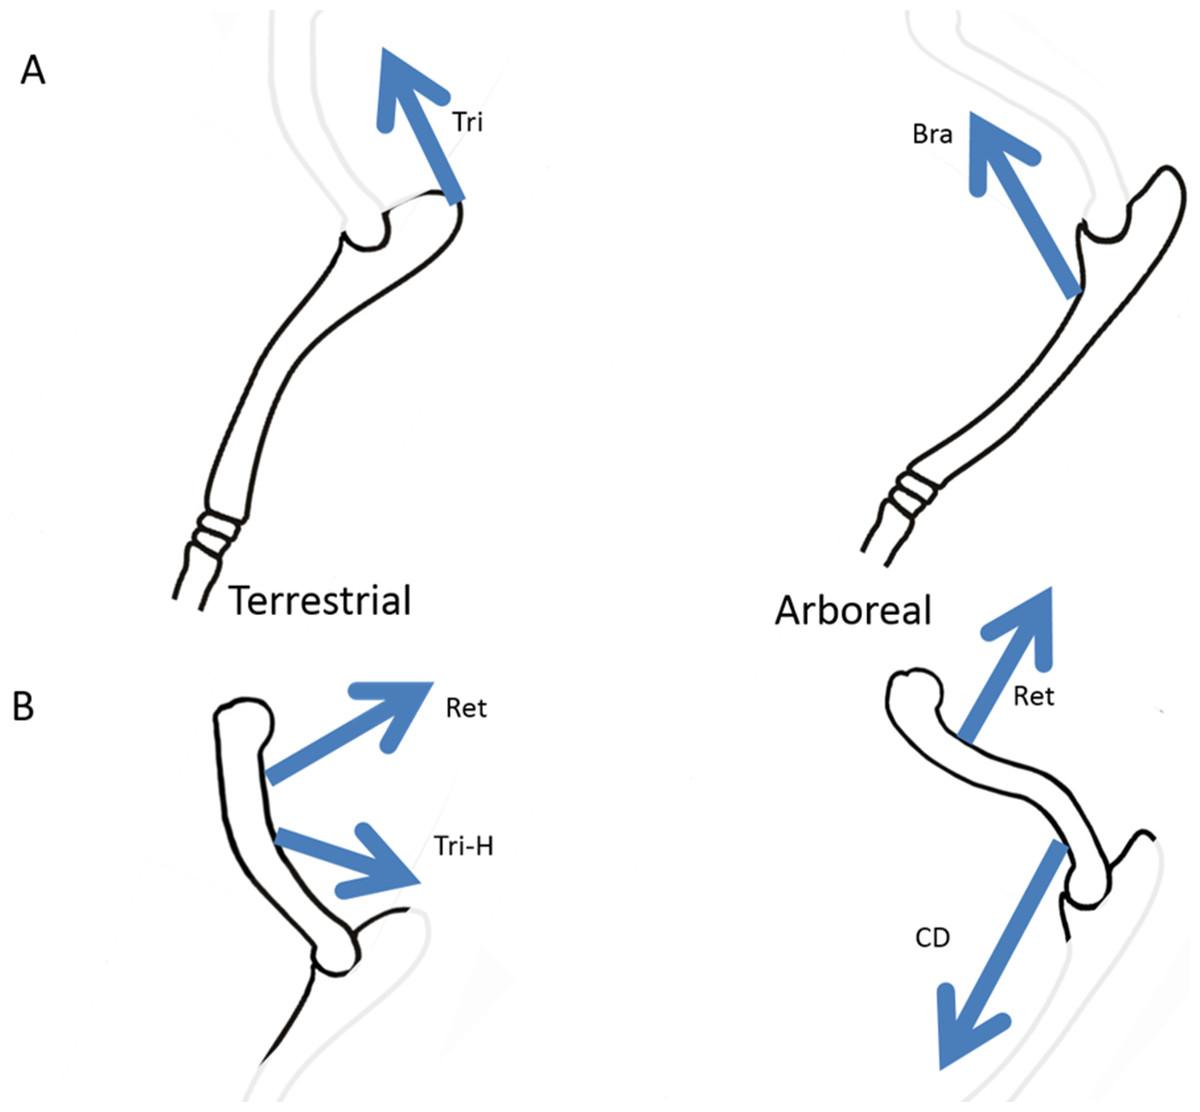 Forelimb Bone Curvature In Terrestrial And Arboreal